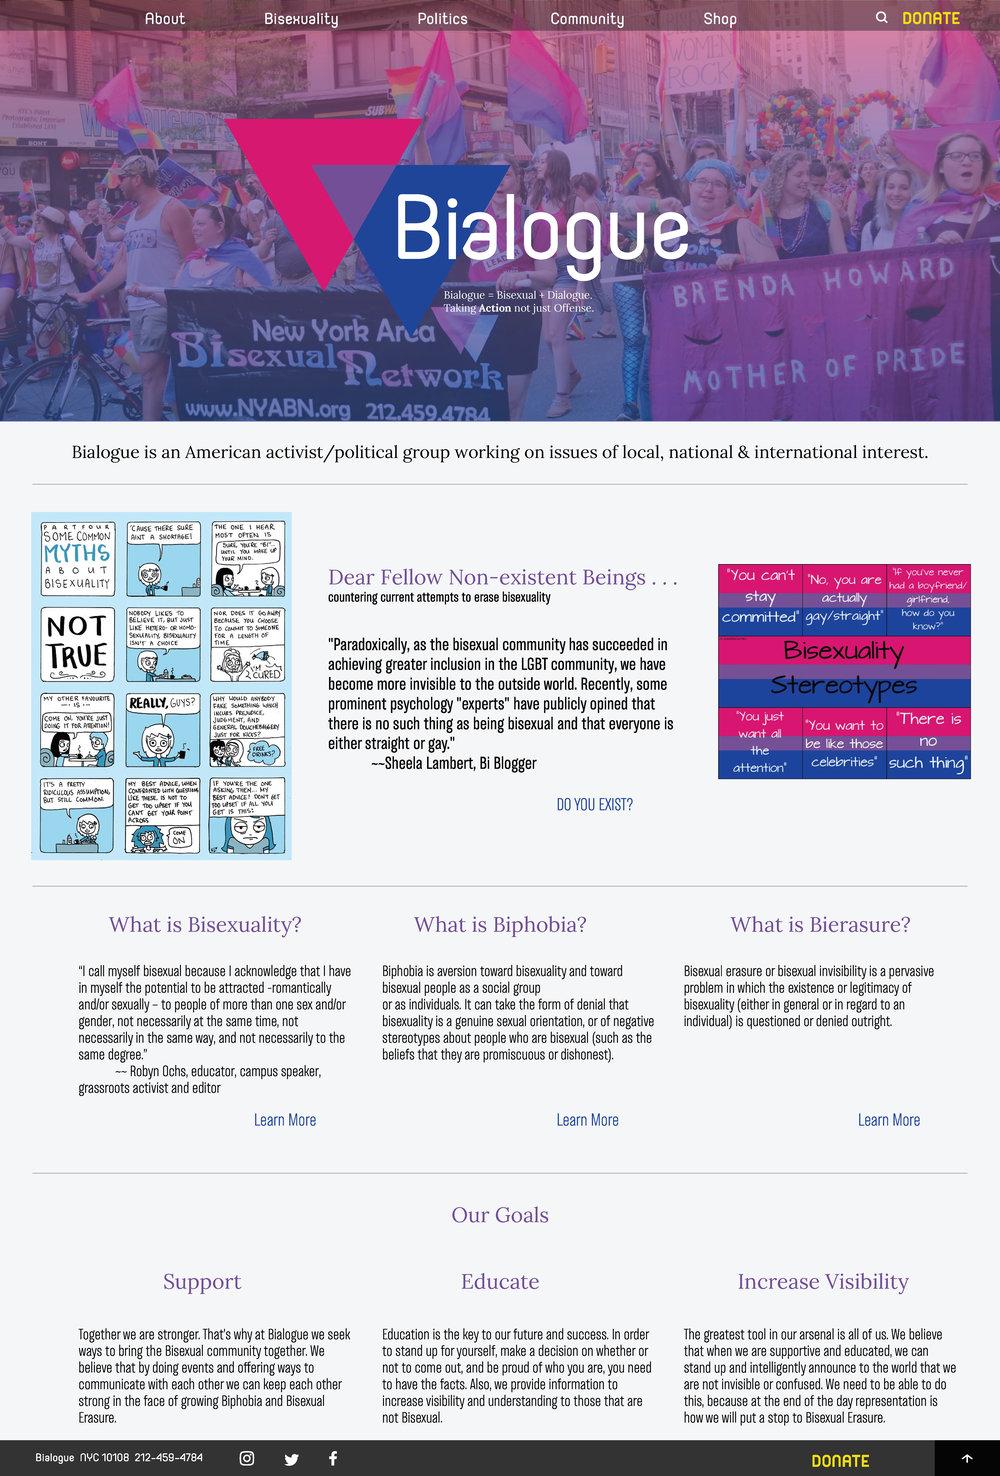 saxtonj_project1_processbook_Page_35.jpg